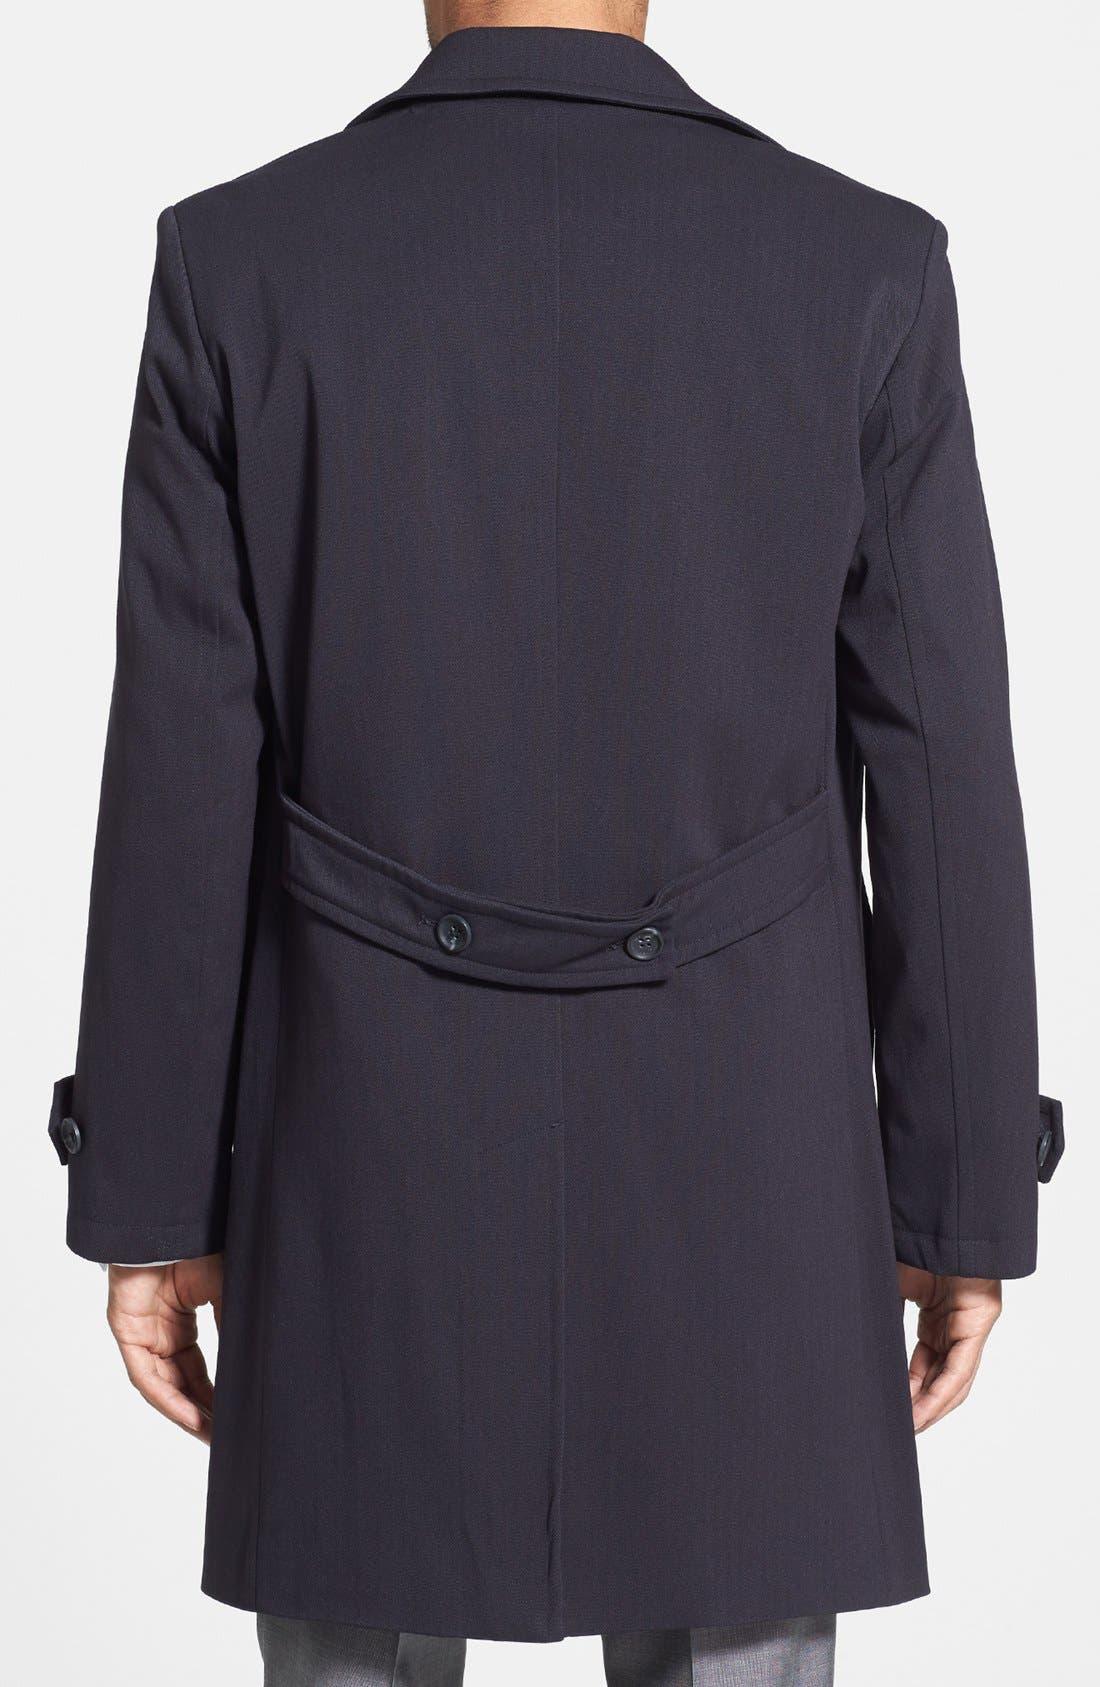 Alternate Image 2  - Michael Kors 'Laz' Waterproof Double Breasted Topcoat